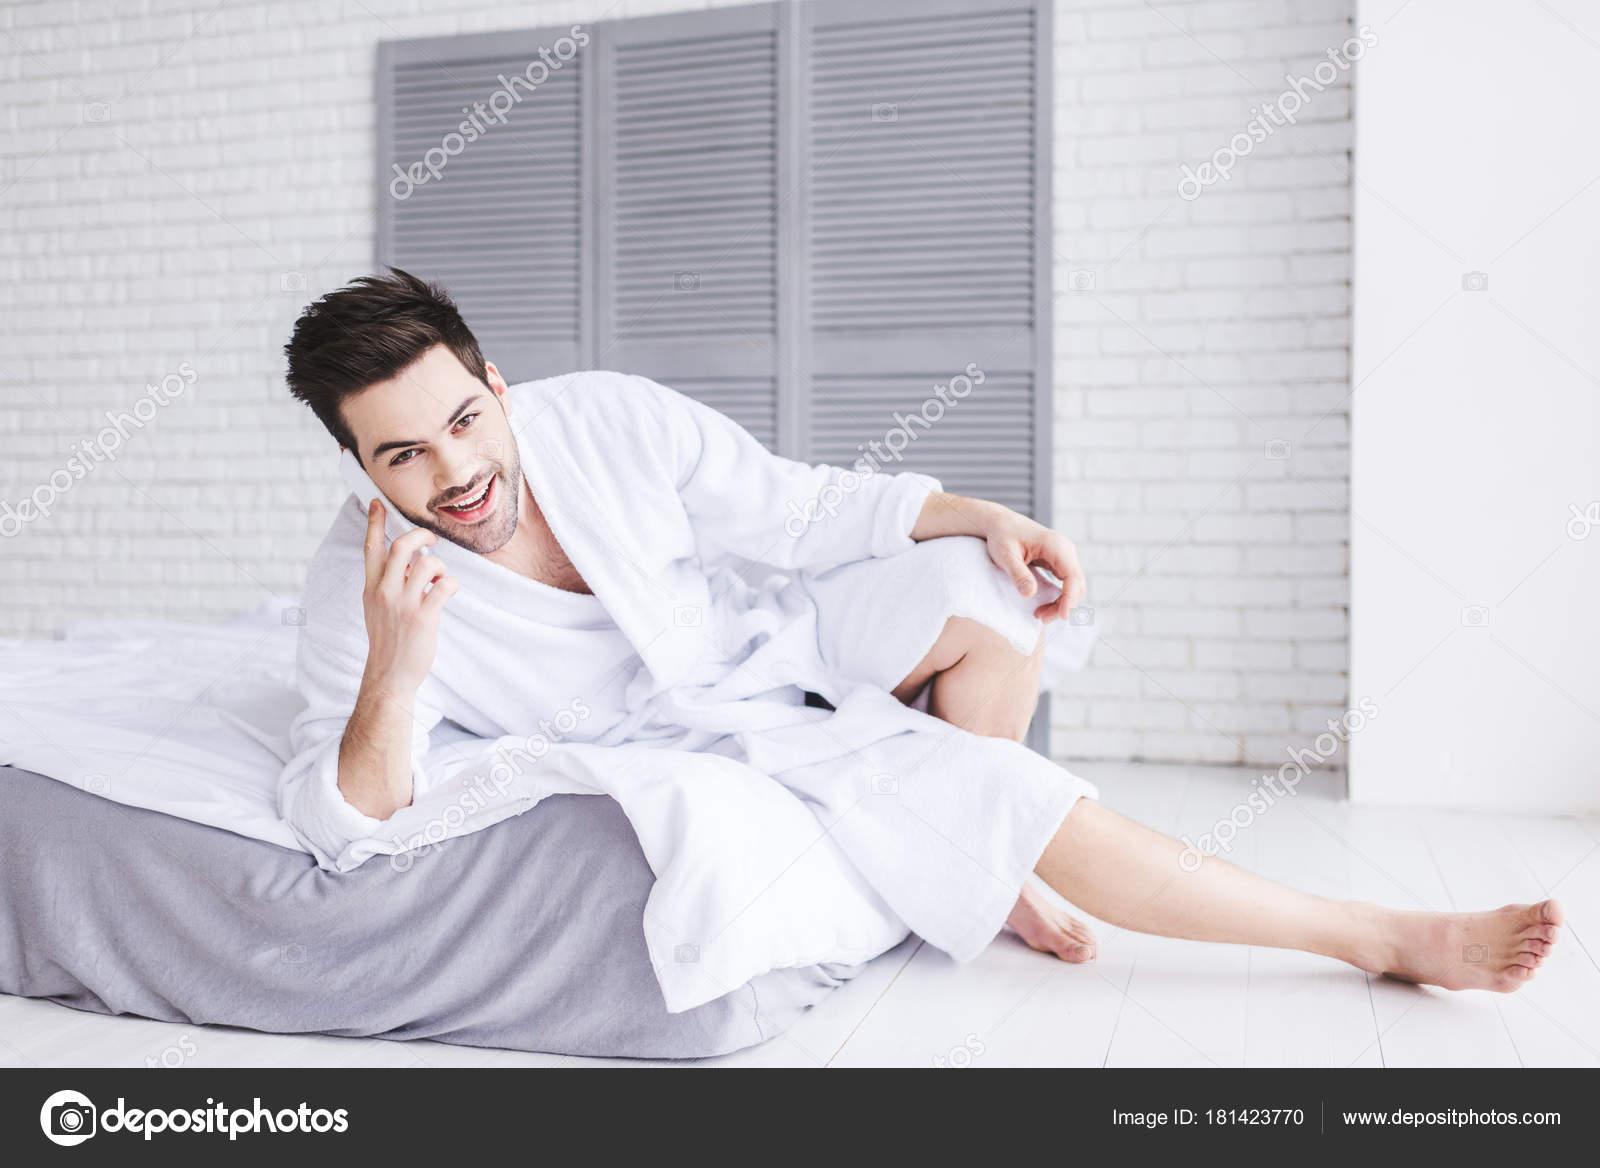 Handsome Young Man Bathrobe Talking Smartphone Looking Camera Free Stock Photo C Sashakhalabuzar 181423770